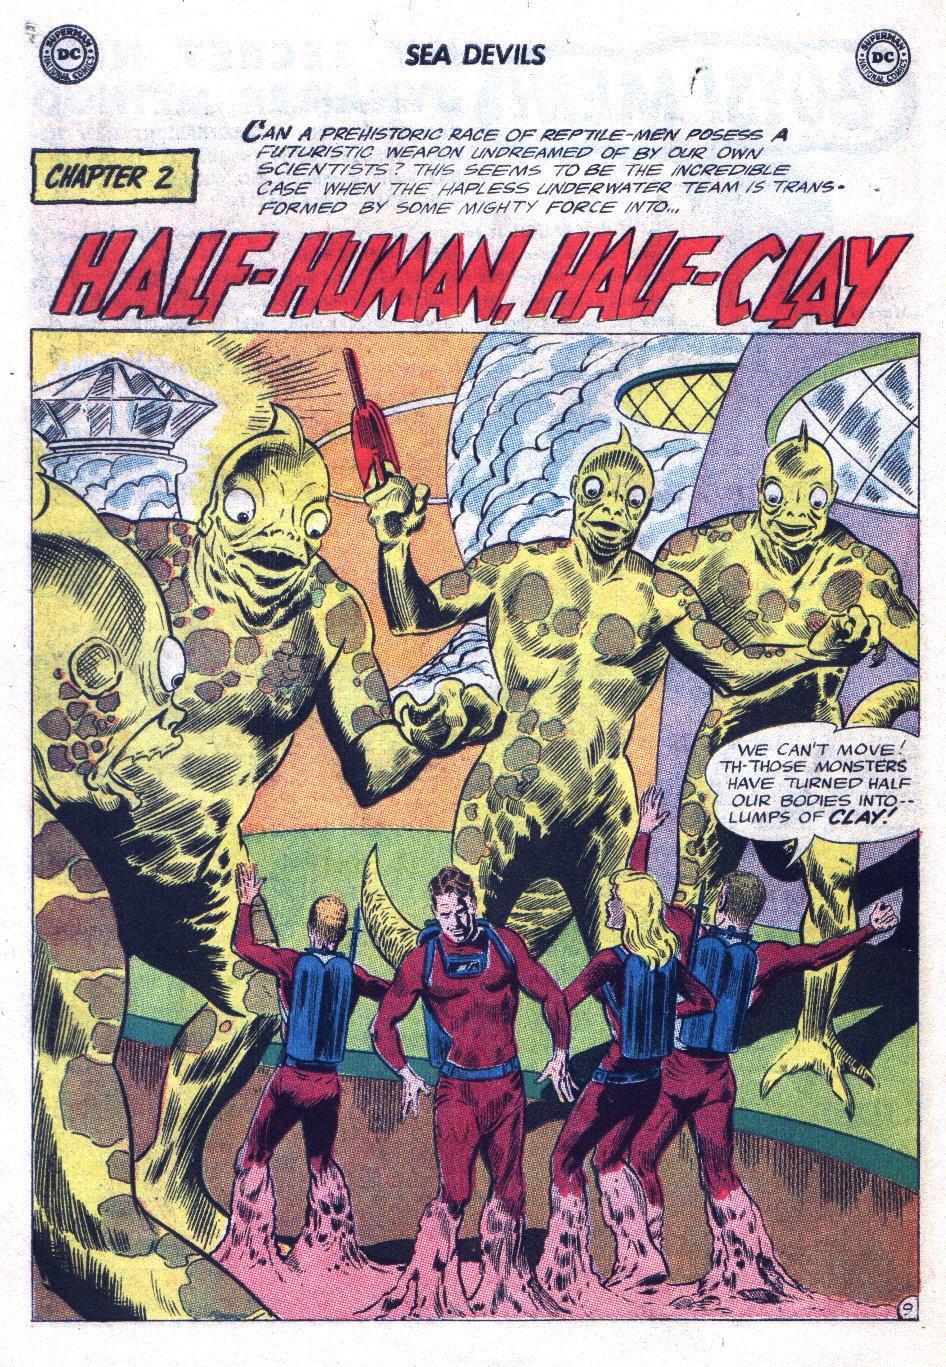 Read online Sea Devils comic -  Issue #20 - 14